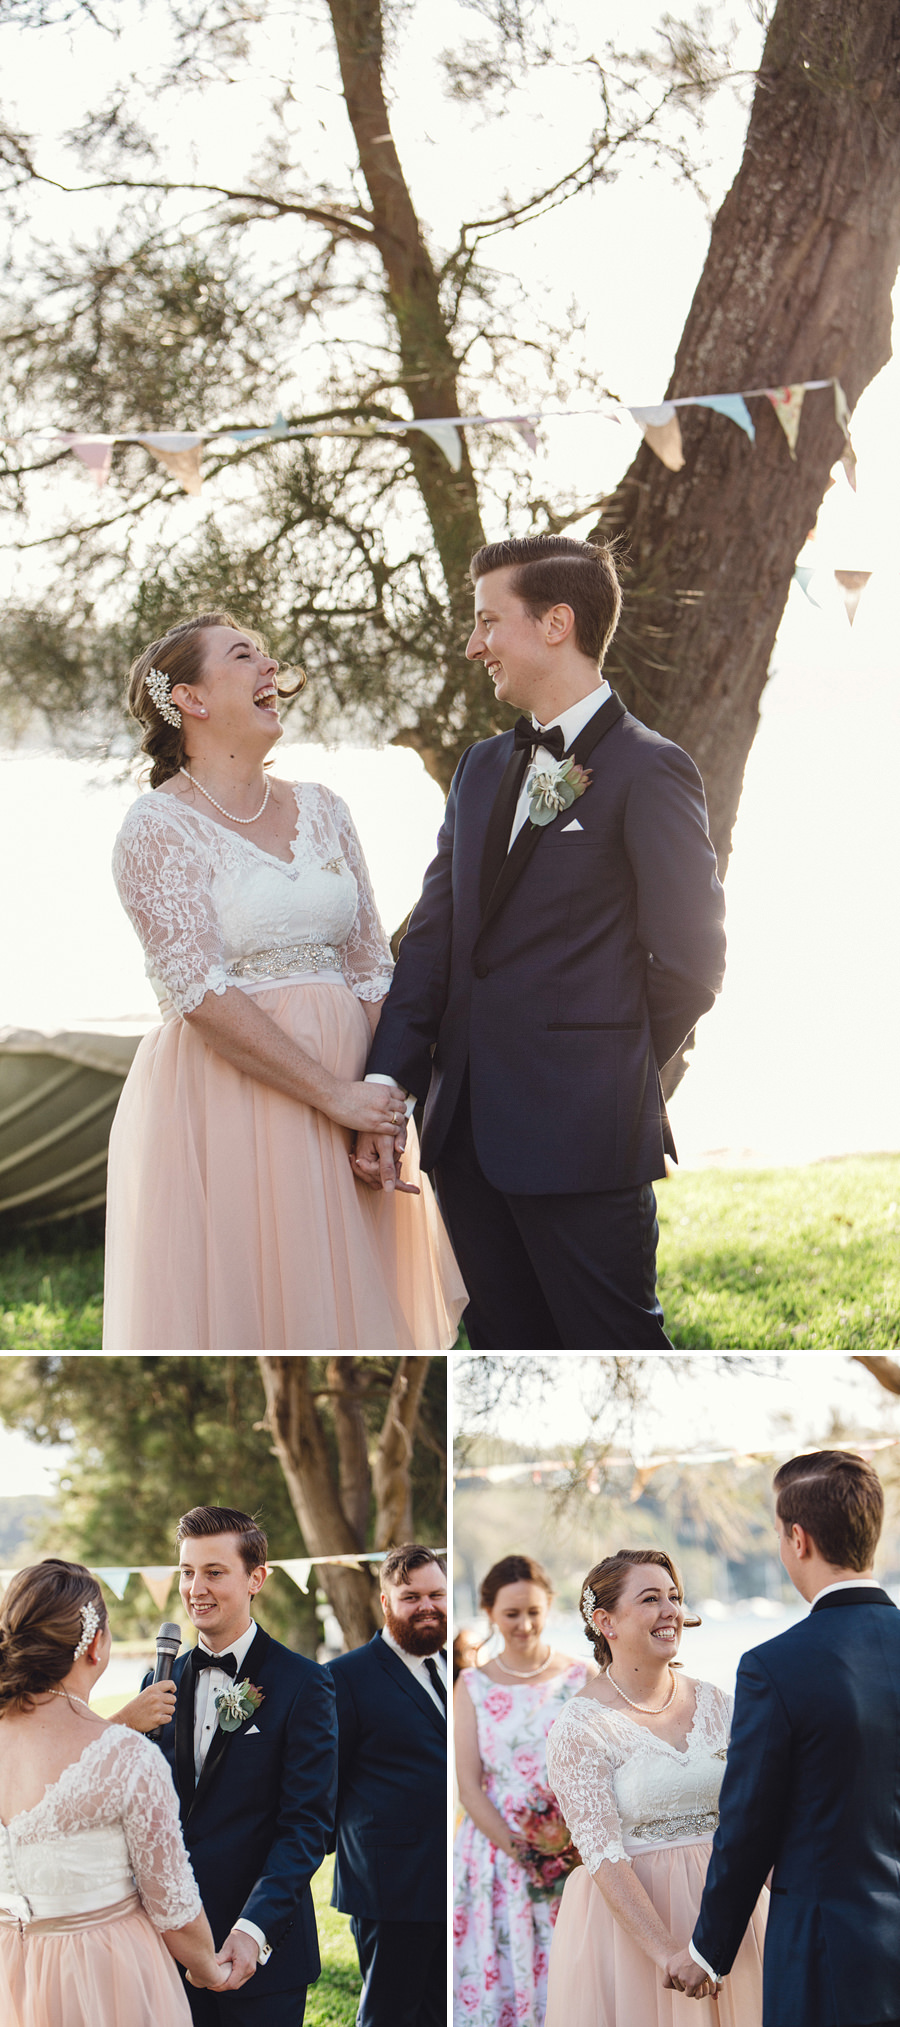 Northern Beaches Wedding Photographers: Ceremony